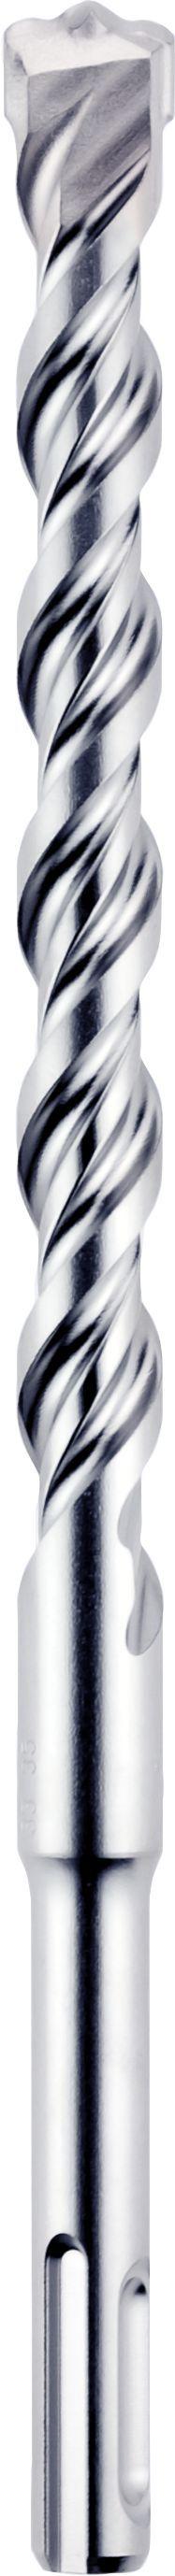 Slika BORER Rocket 3 SDS-plus 10x260 mm